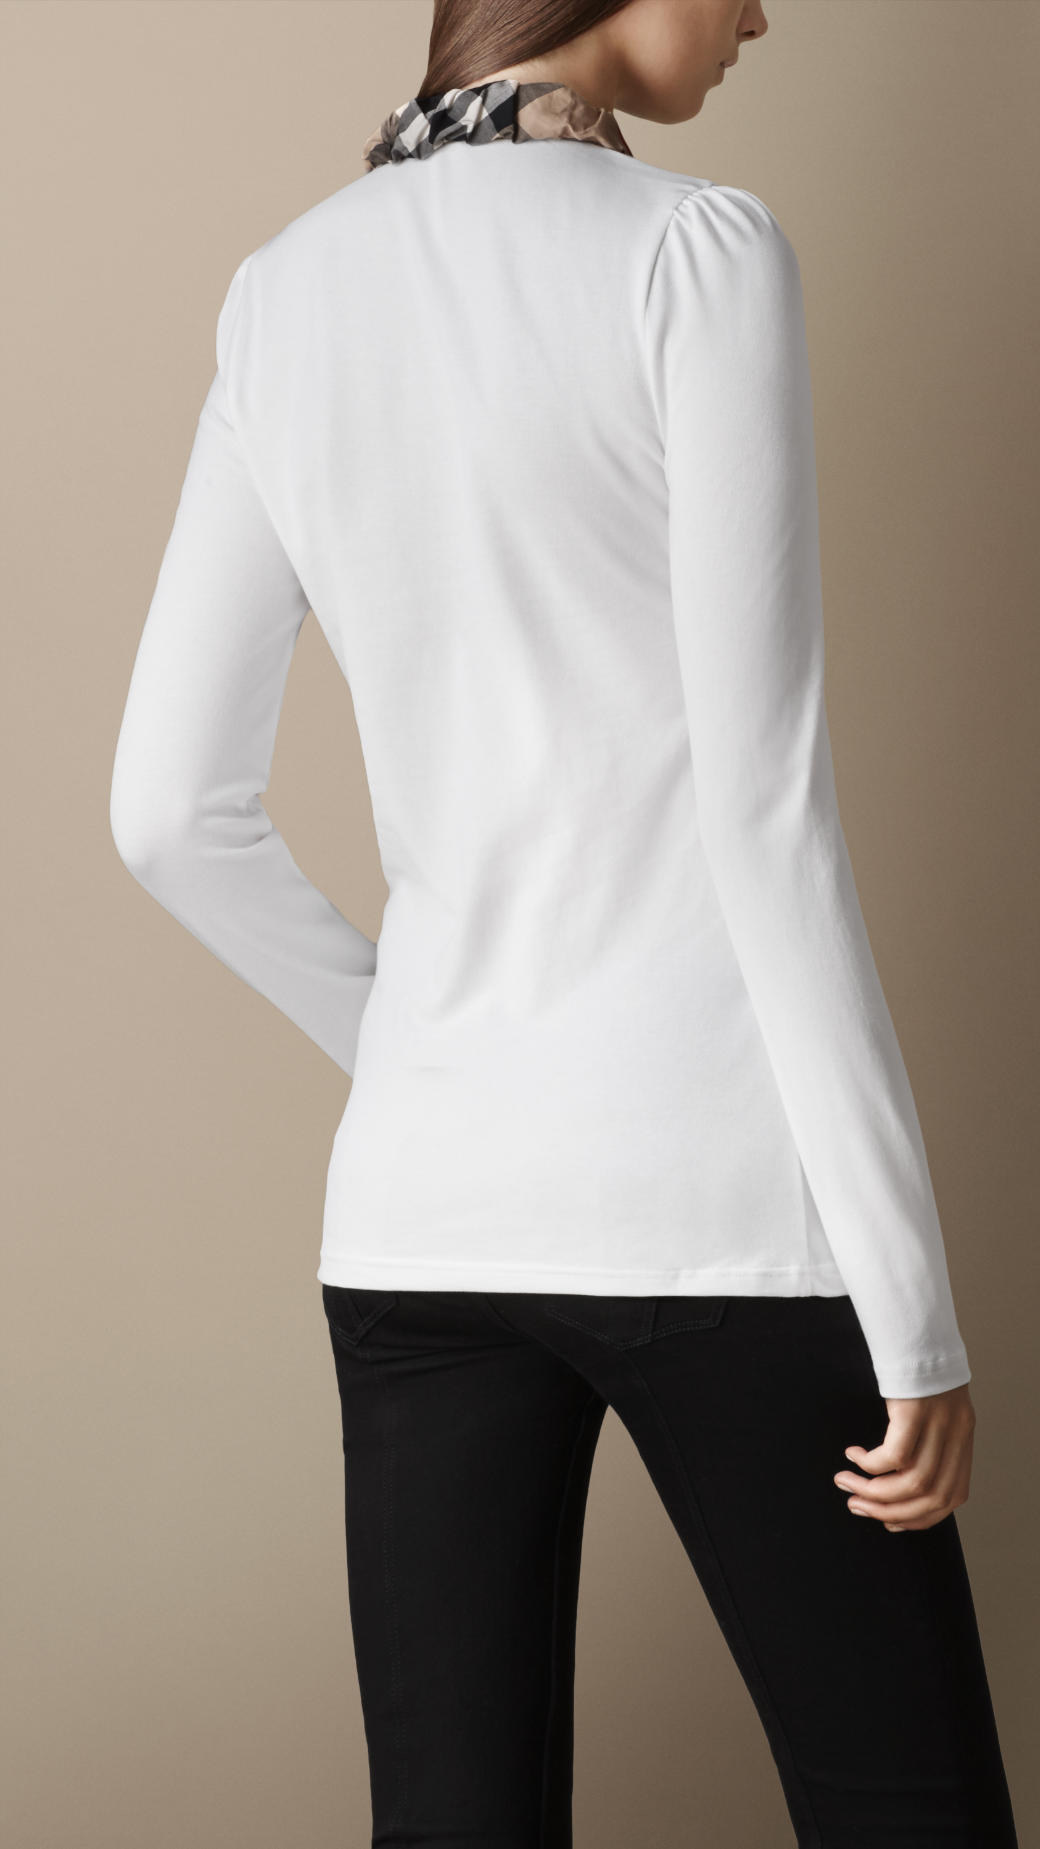 Womens Long Sleeve Polo Shirts Australia Rockwall Auction